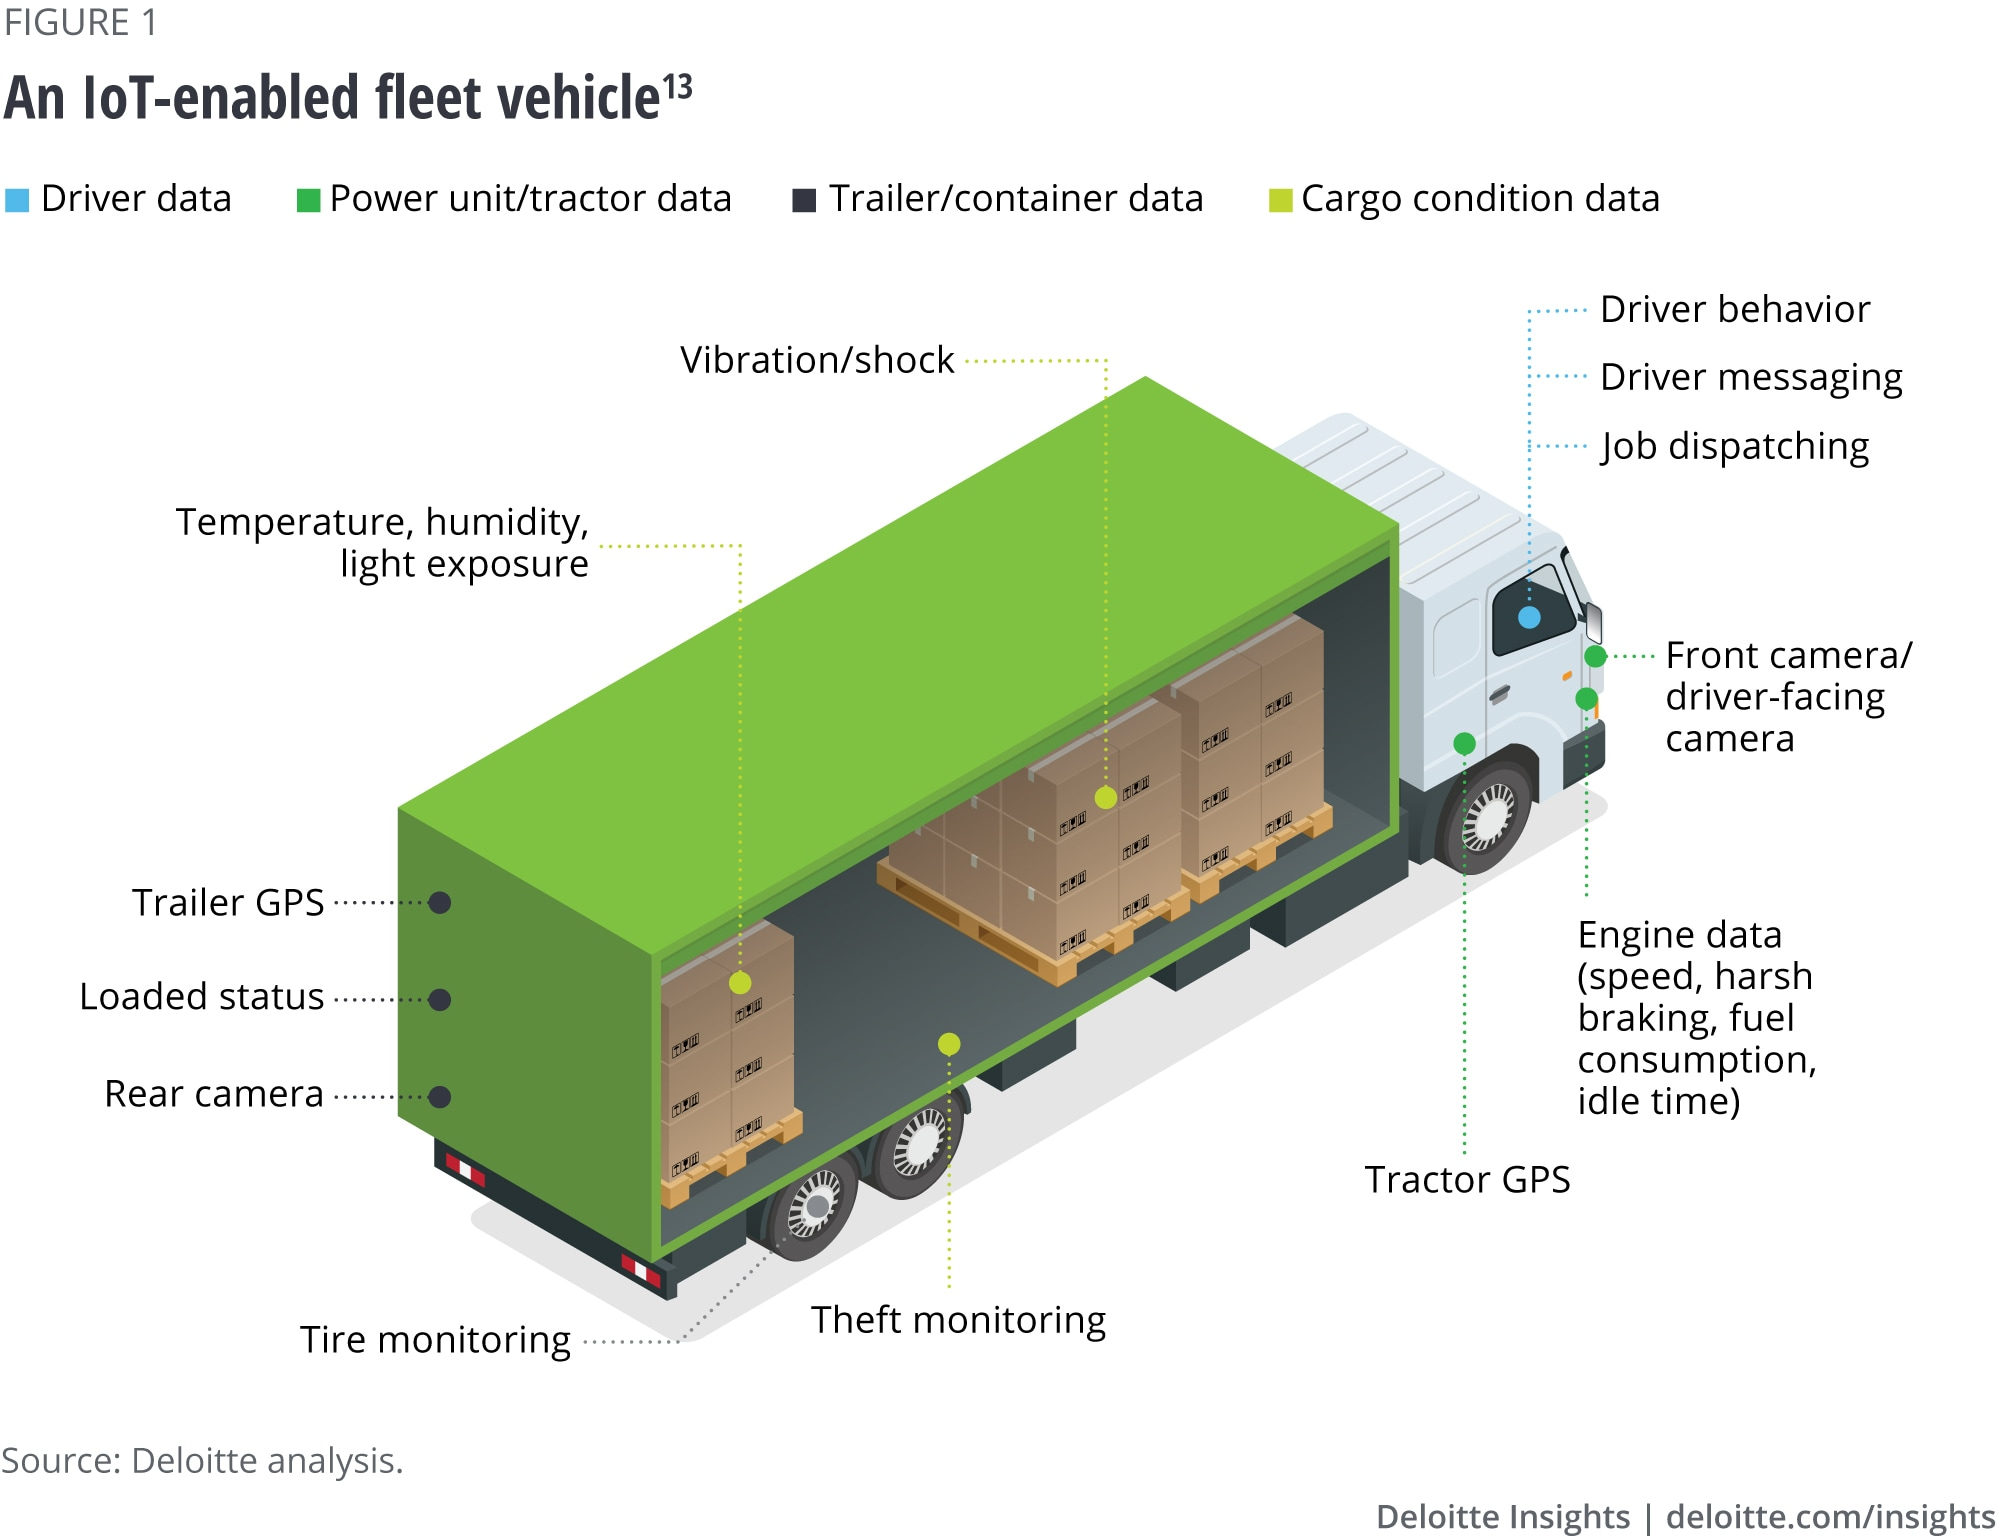 An IoT-enabled fleet vehicle